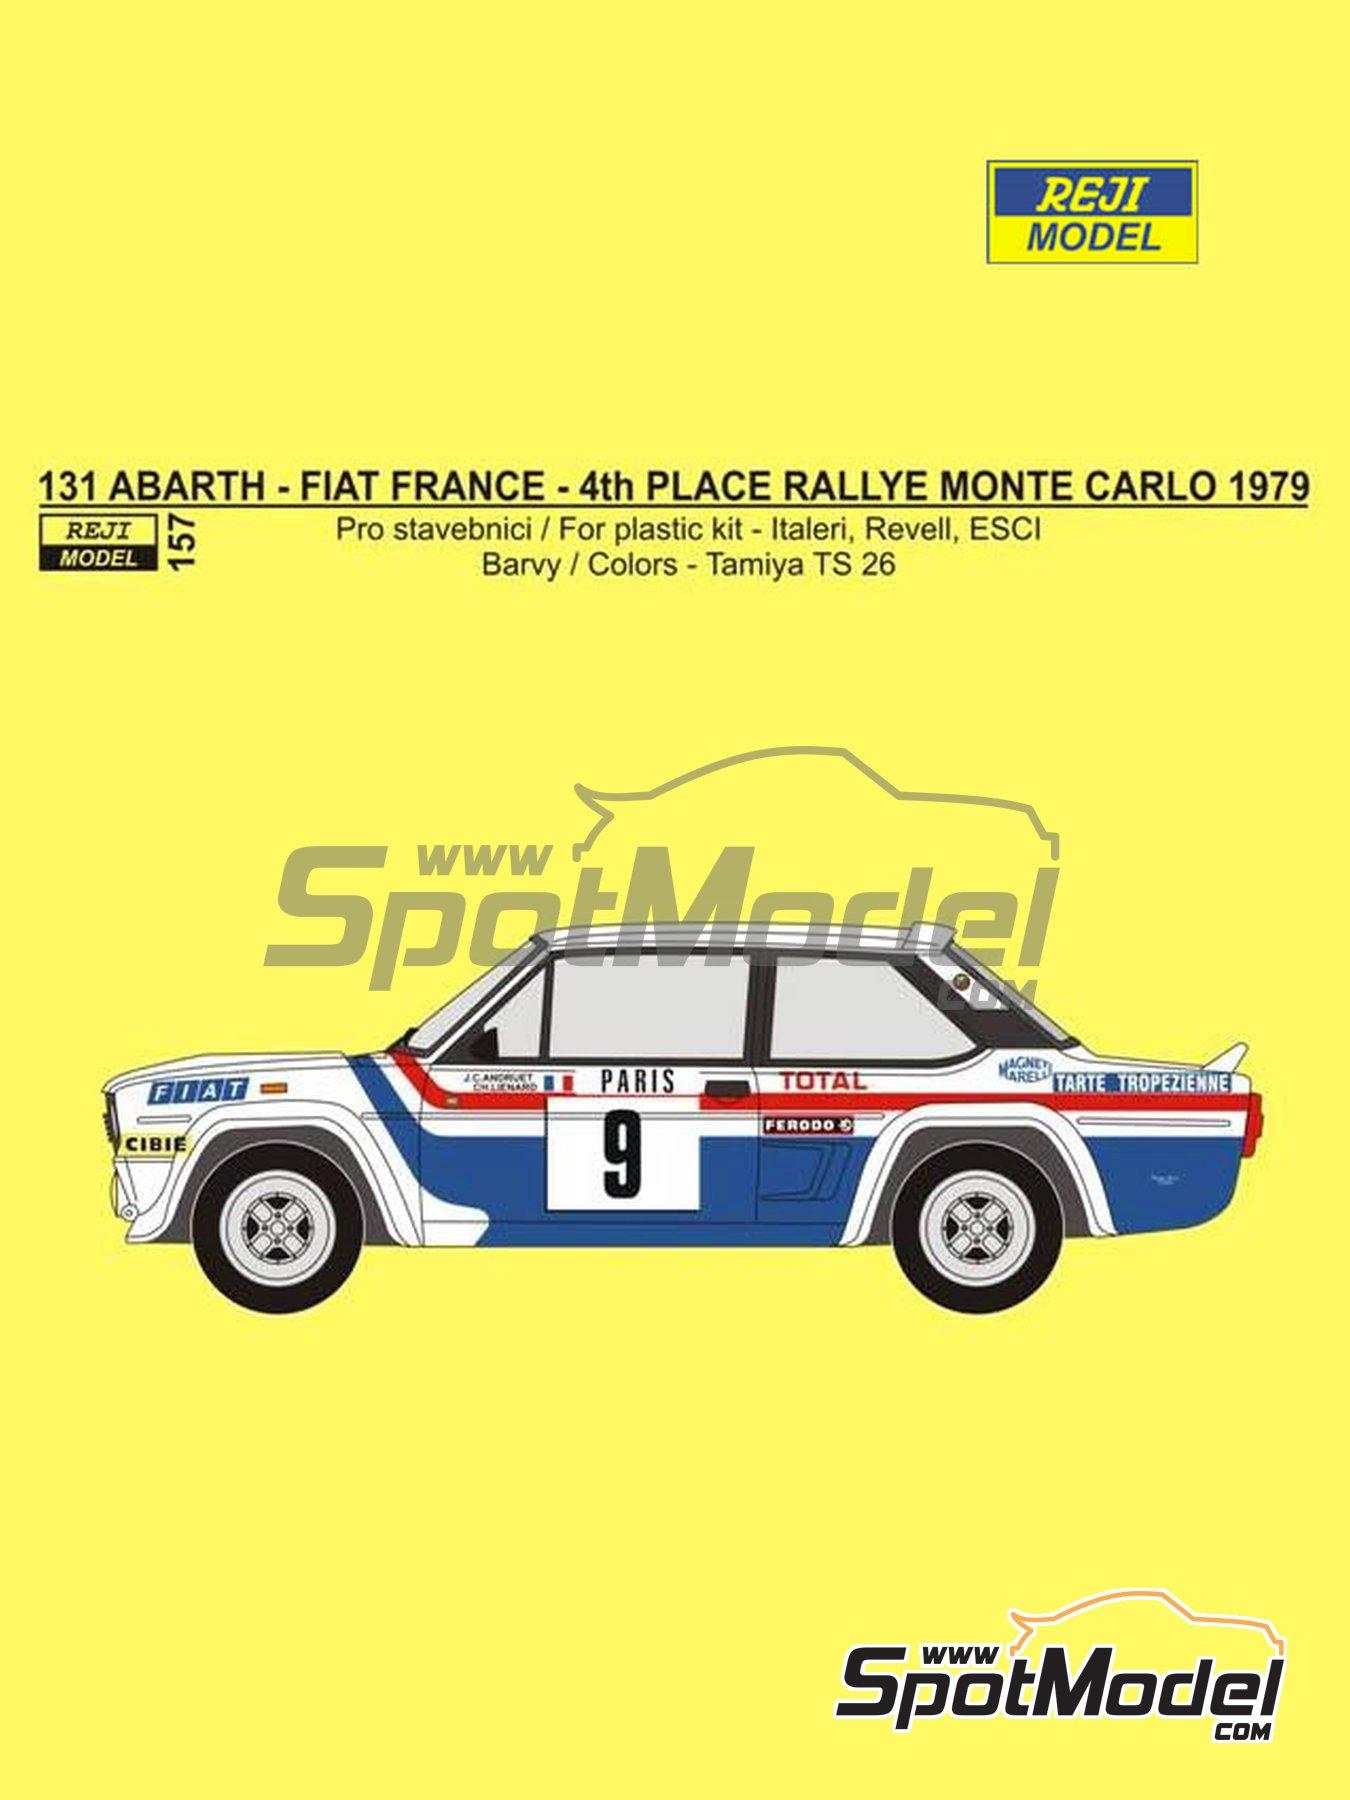 Fiat 131 Abarth Fiat France - Montecarlo Rally - Rallye Automobile de Monte-Carlo 1979 | Marking / livery in 1/24 scale manufactured by Reji Model (ref.REJI-157) image